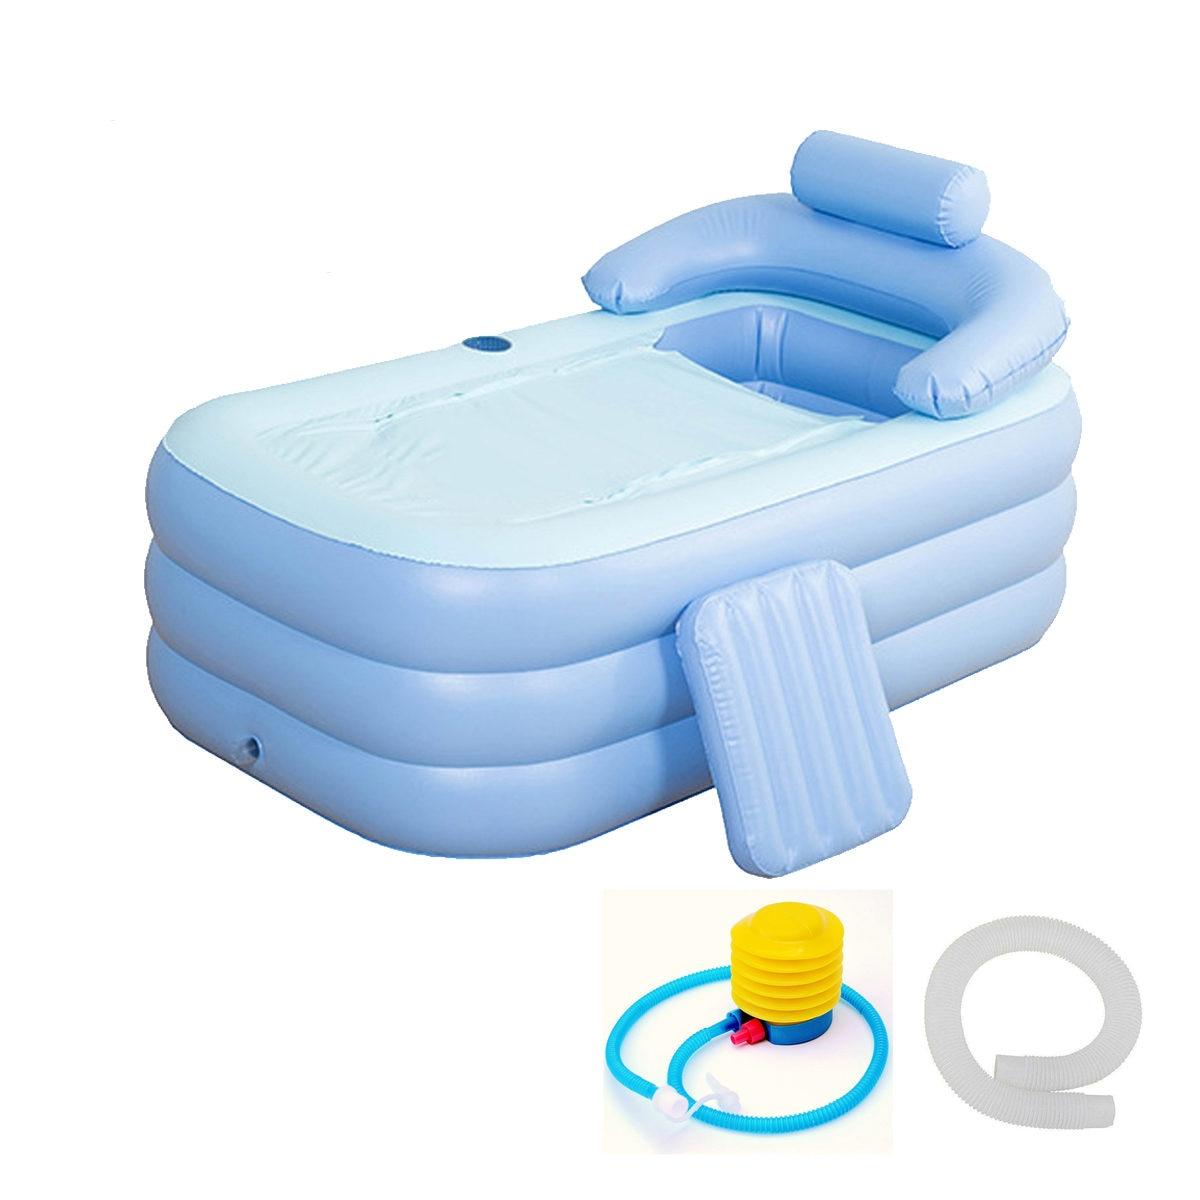 81aaf376bb 160  84  64cm Blue Large Size Inflatable Bath Bathtub SPA PVC Folding  Portable For